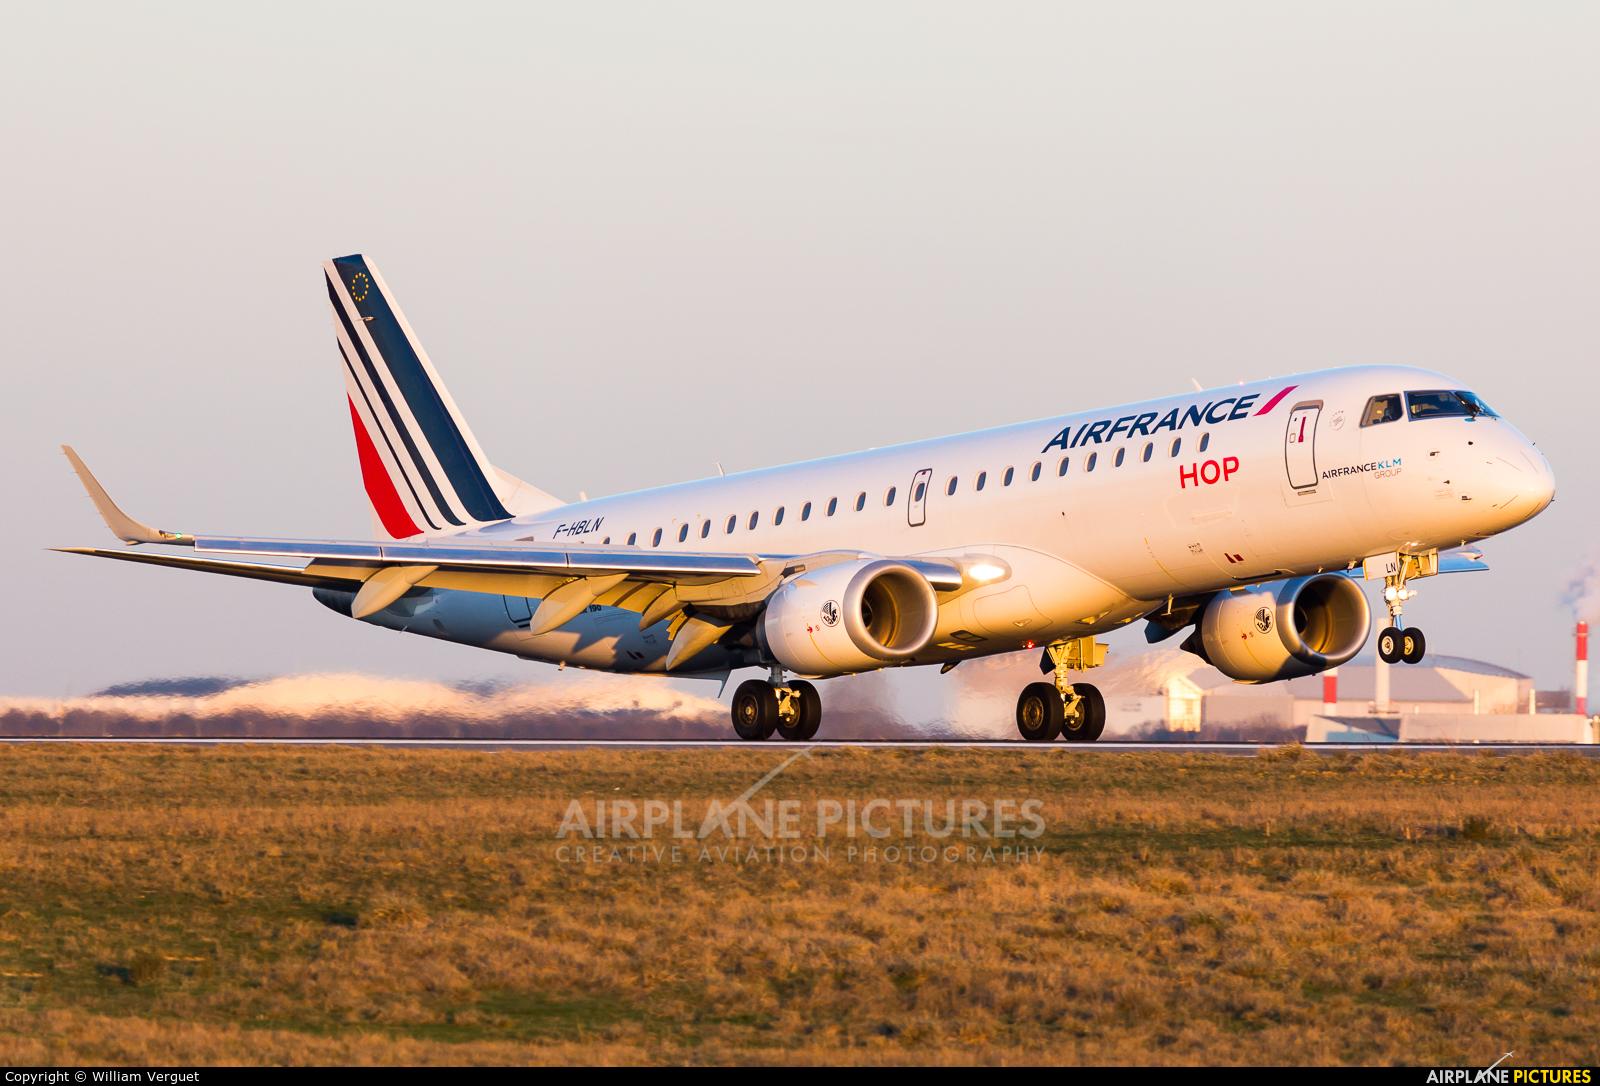 Air France - Hop! F-HBLN aircraft at Paris - Charles de Gaulle